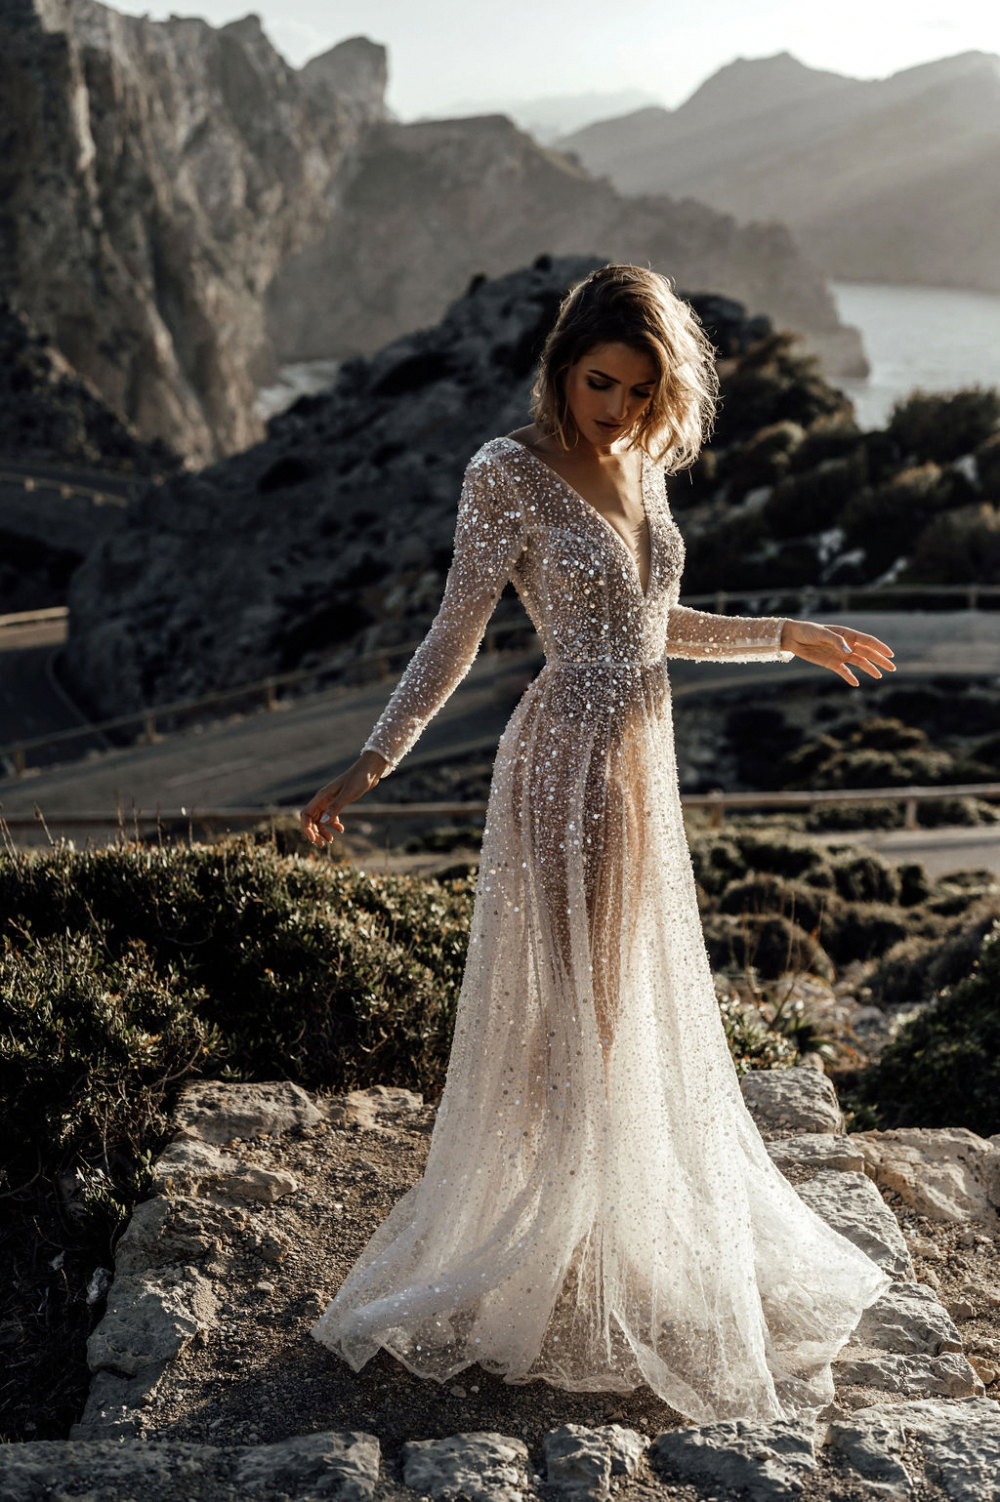 Weddingdress Wedding Dress Sequin Best Wedding Guest Dresses Dream Wedding Dresses [ 1502 x 1000 Pixel ]